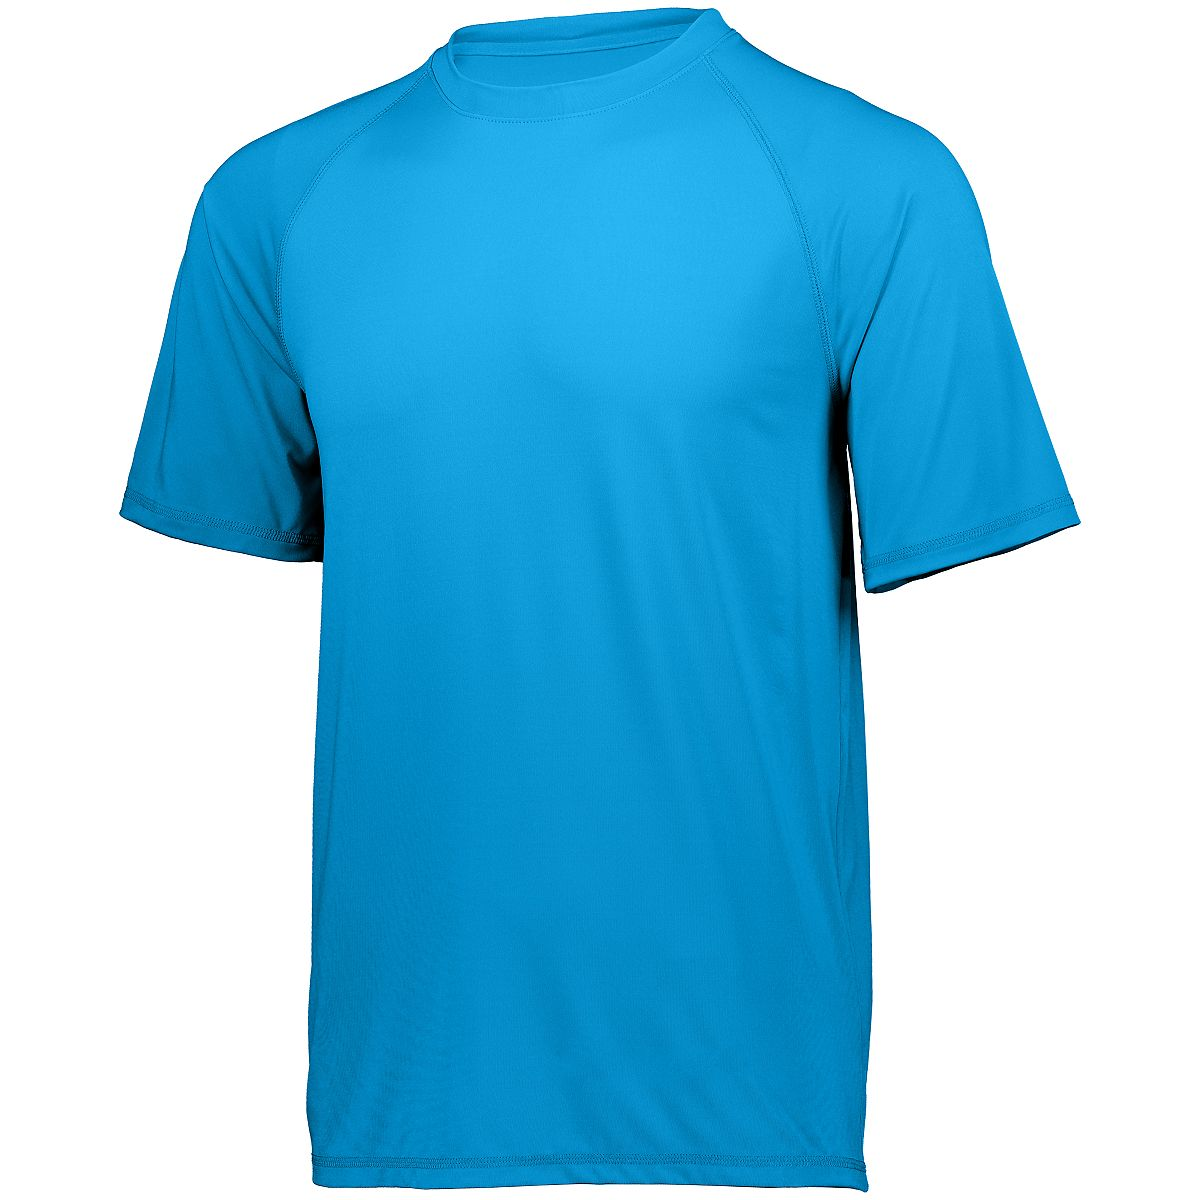 Holloway Swift Wicking Shirt Brt Blue L - image 1 of 1